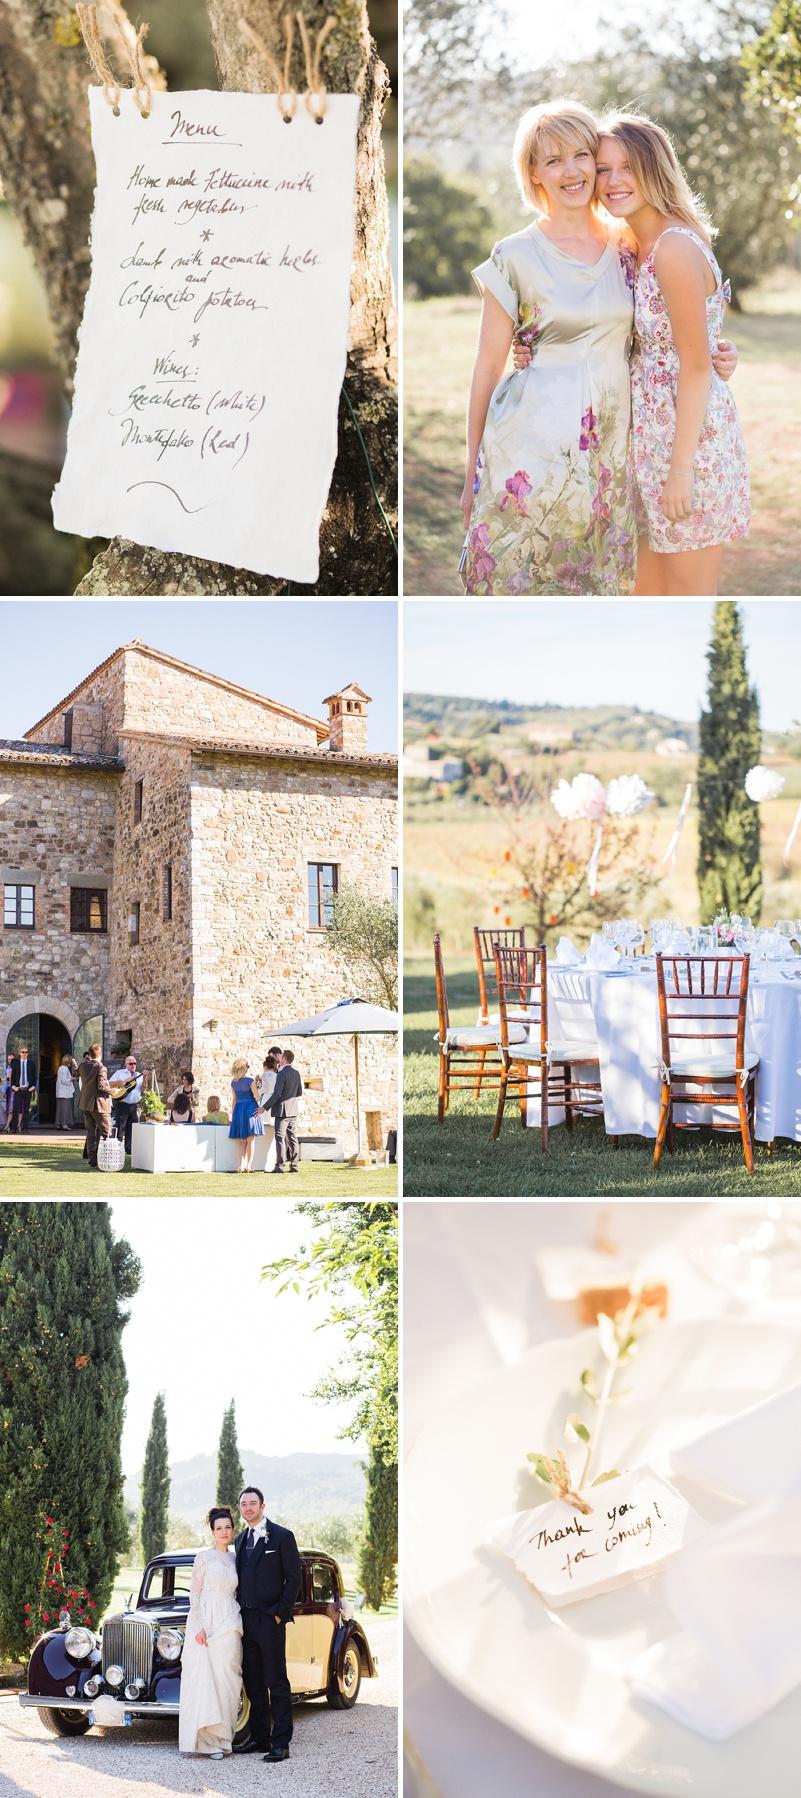 A Italian Destination Wedding In Tuscany with a Katya Katya Shehurina dress._0009